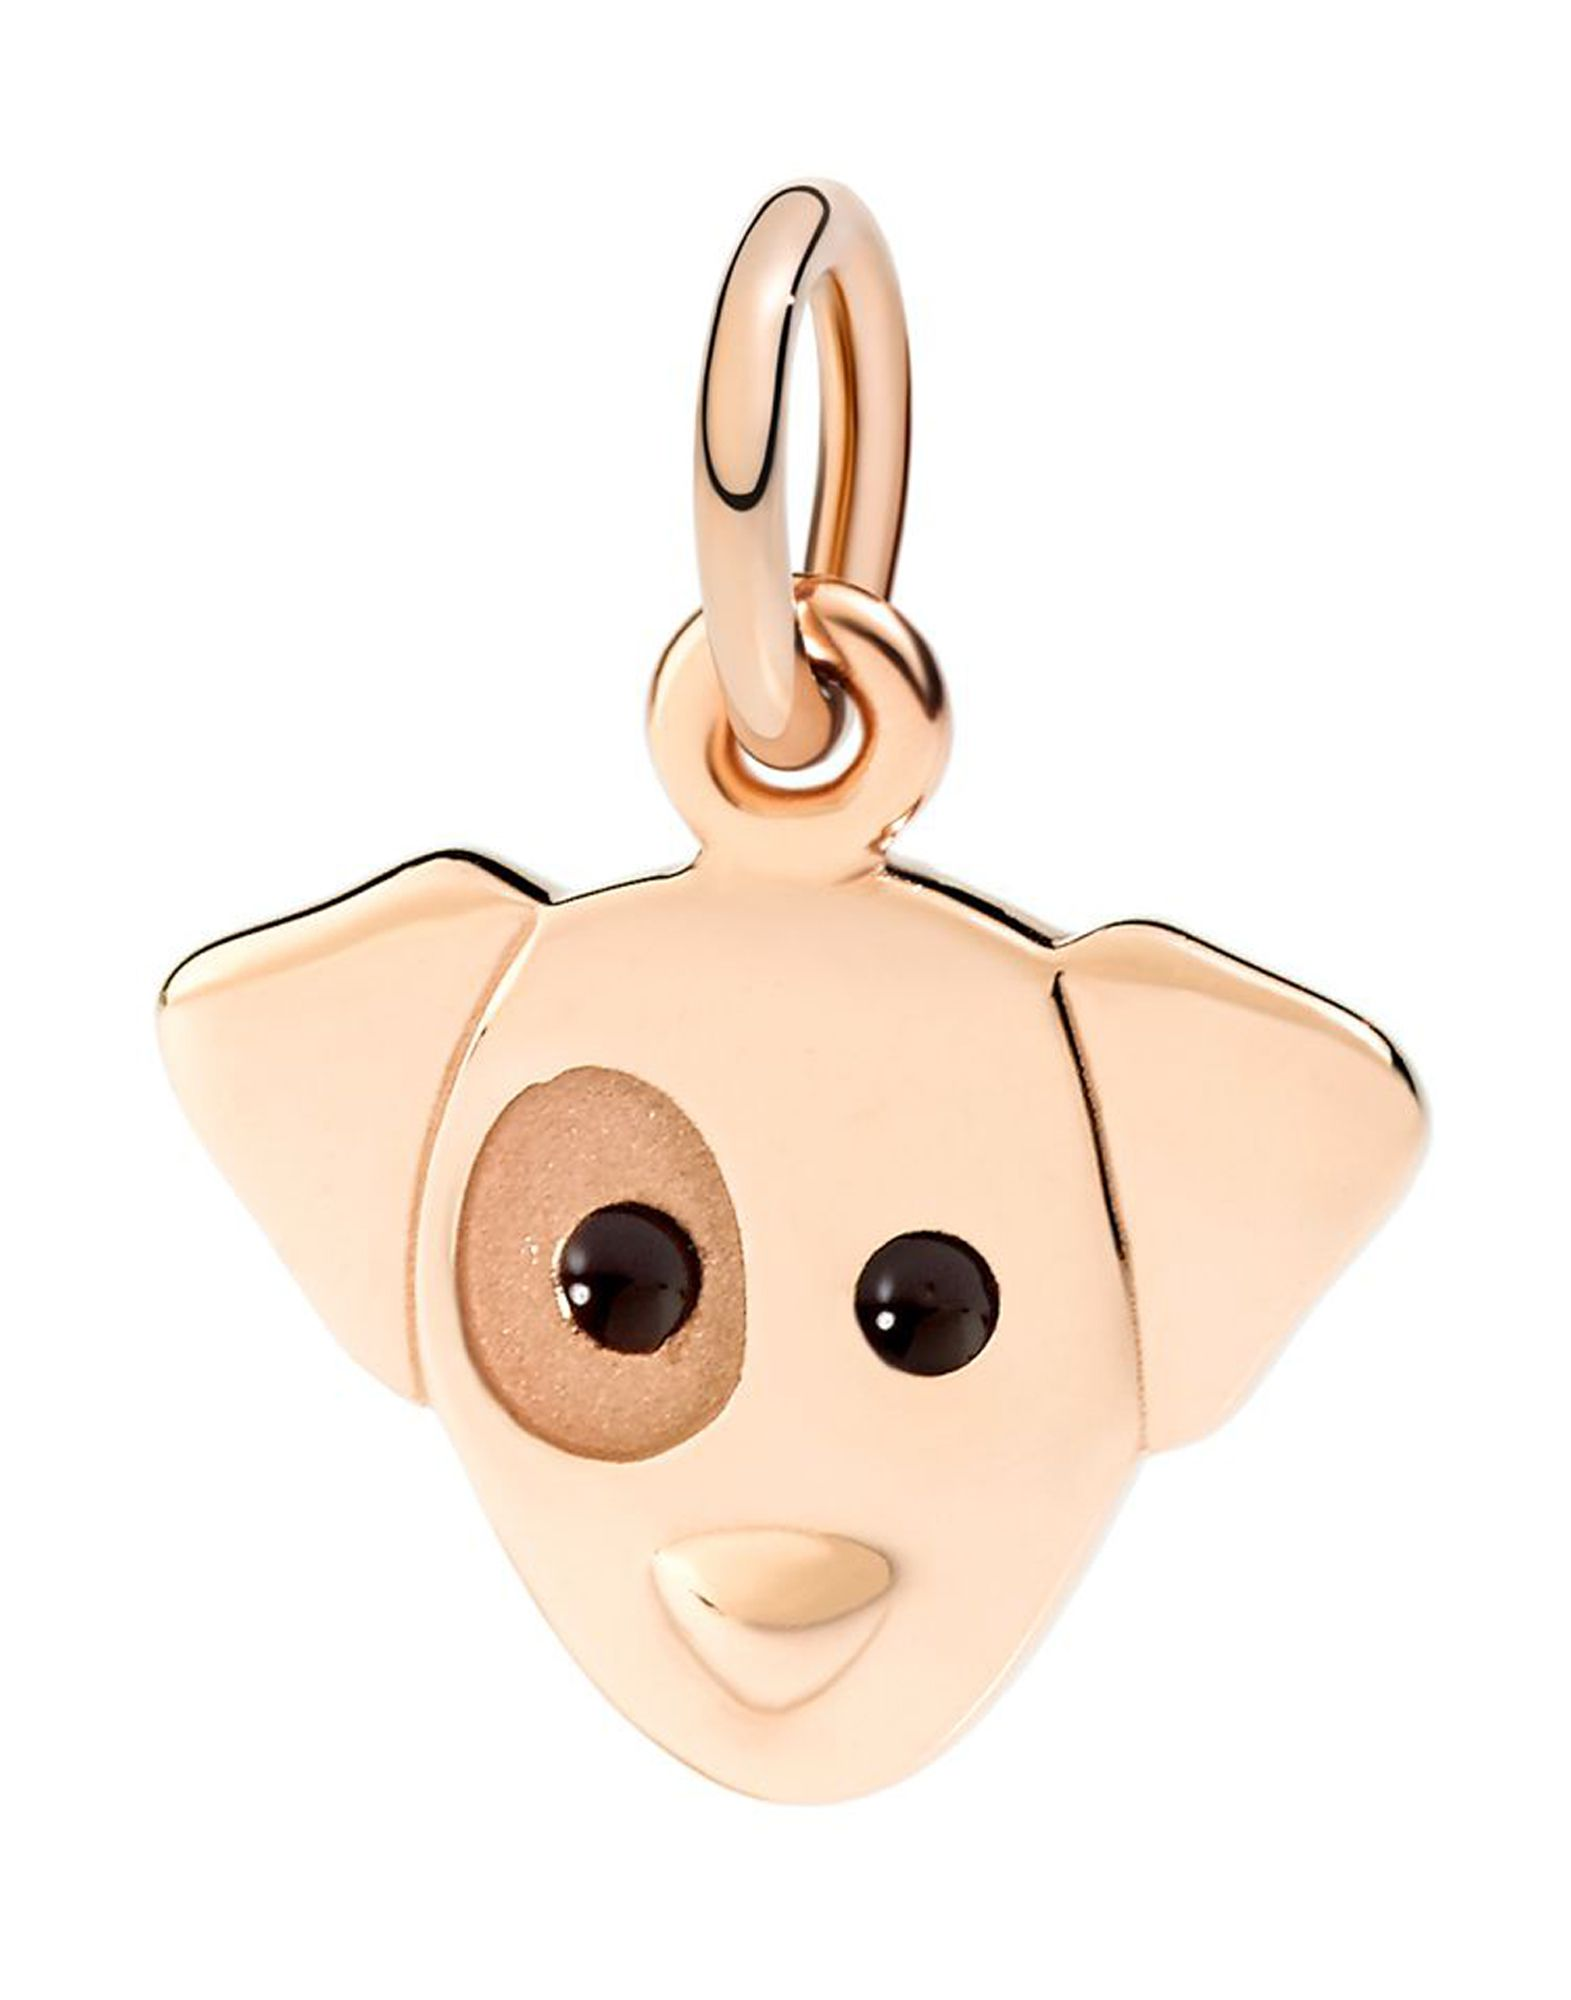 Ciondolo Dodo Jack Russell - Uomo - Acquista online su